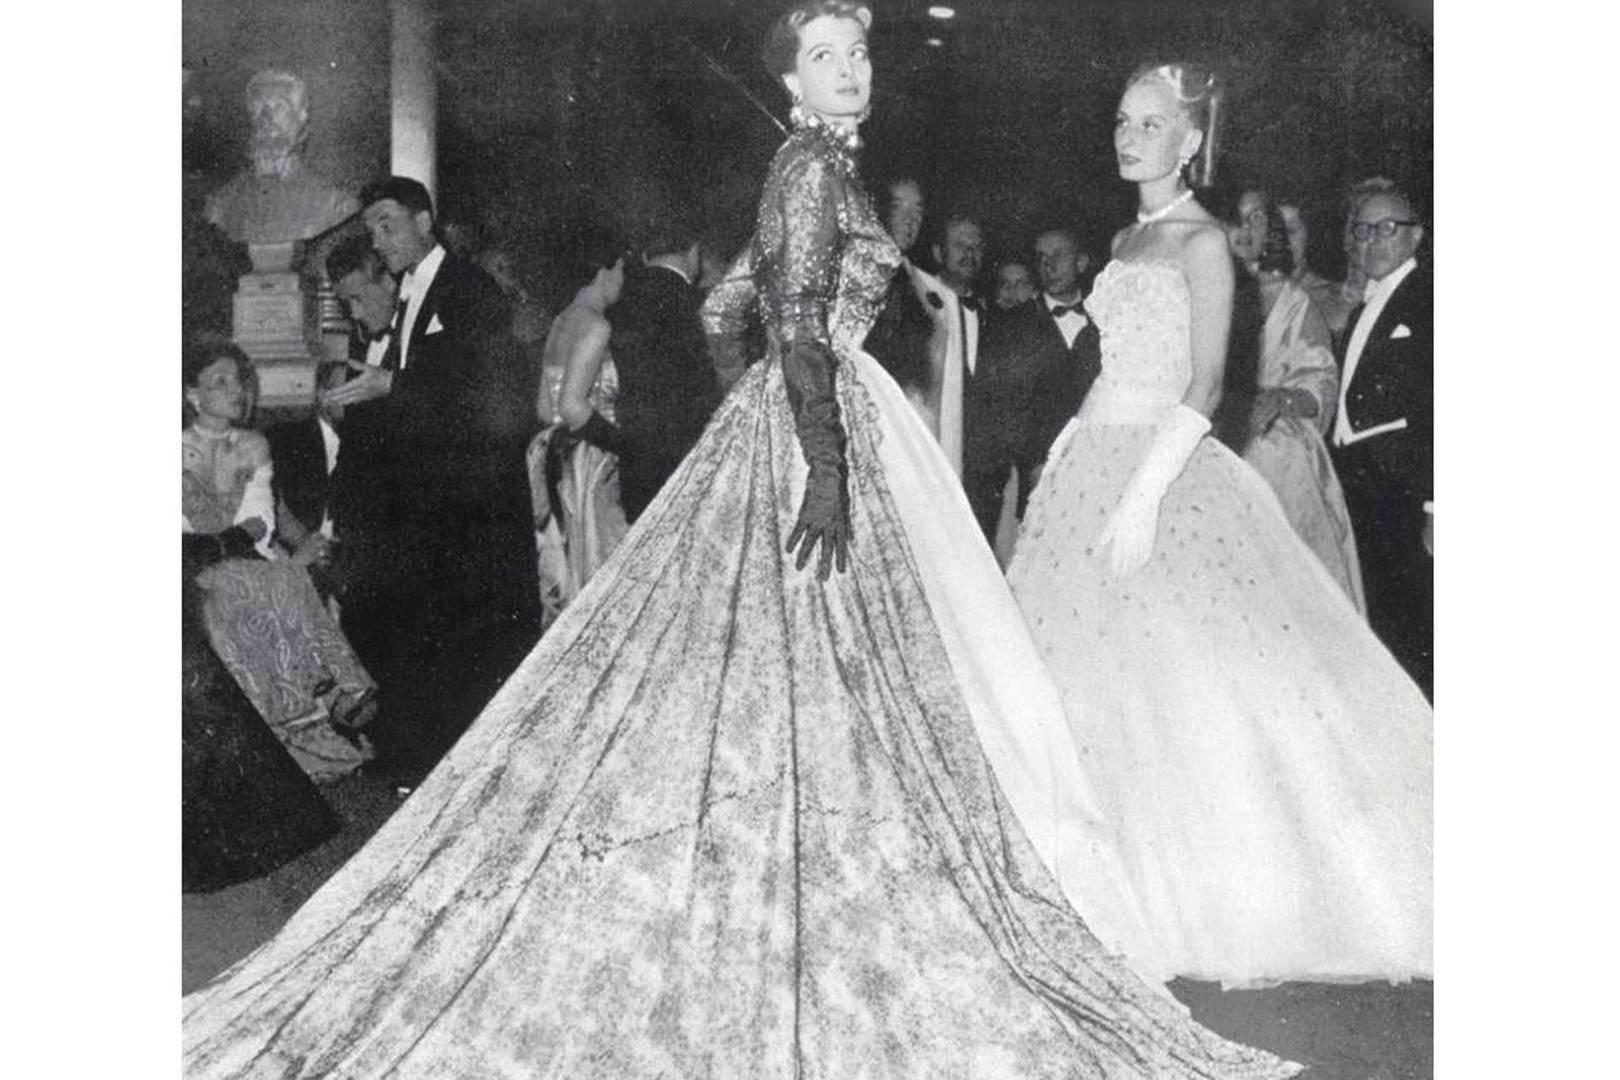 a27618791 Remembering Hubert de Givenchy | British Vogue